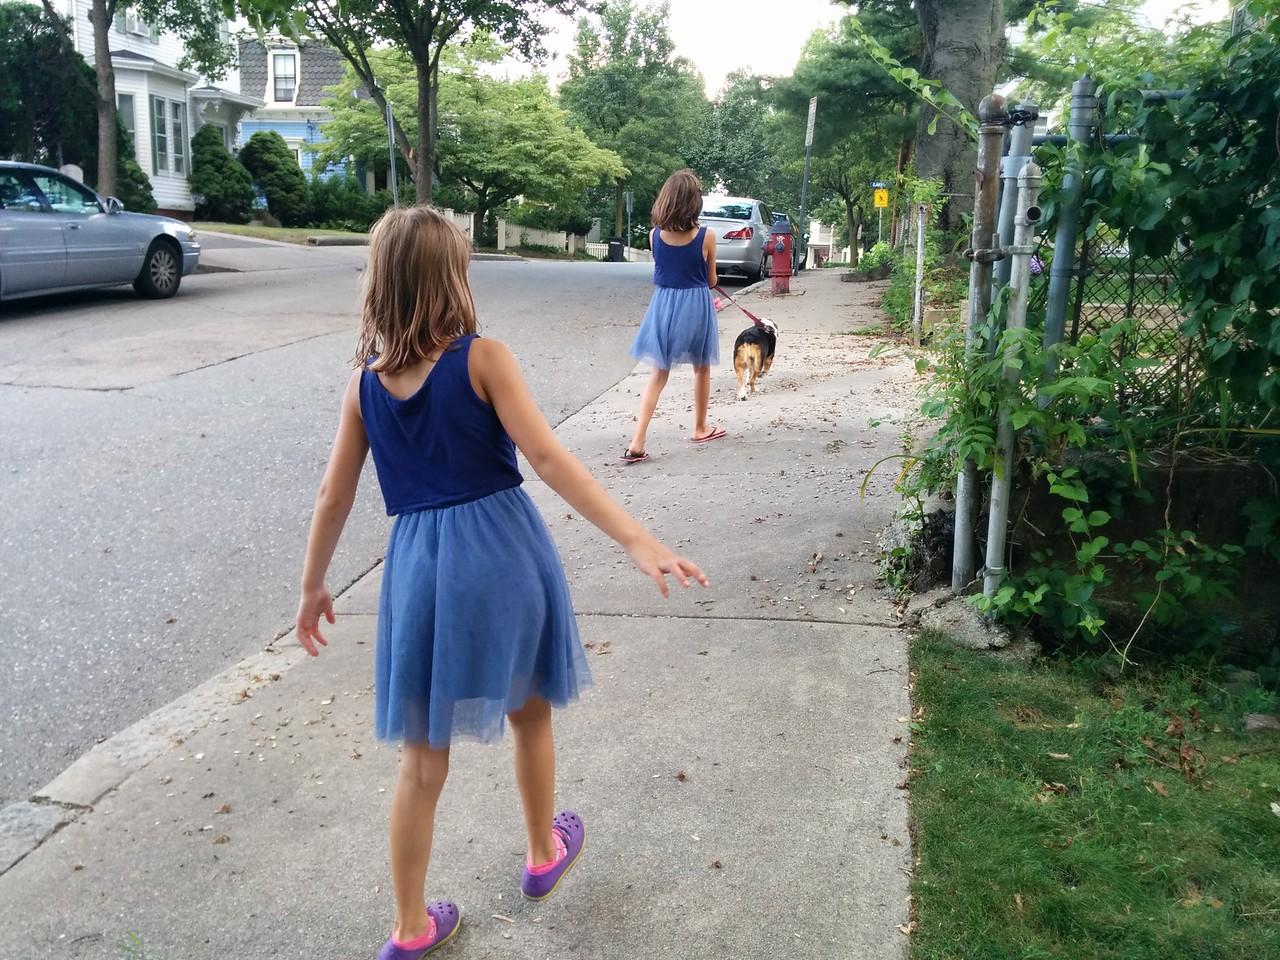 Guen walks the dog while Anya carefully keeps her distance.